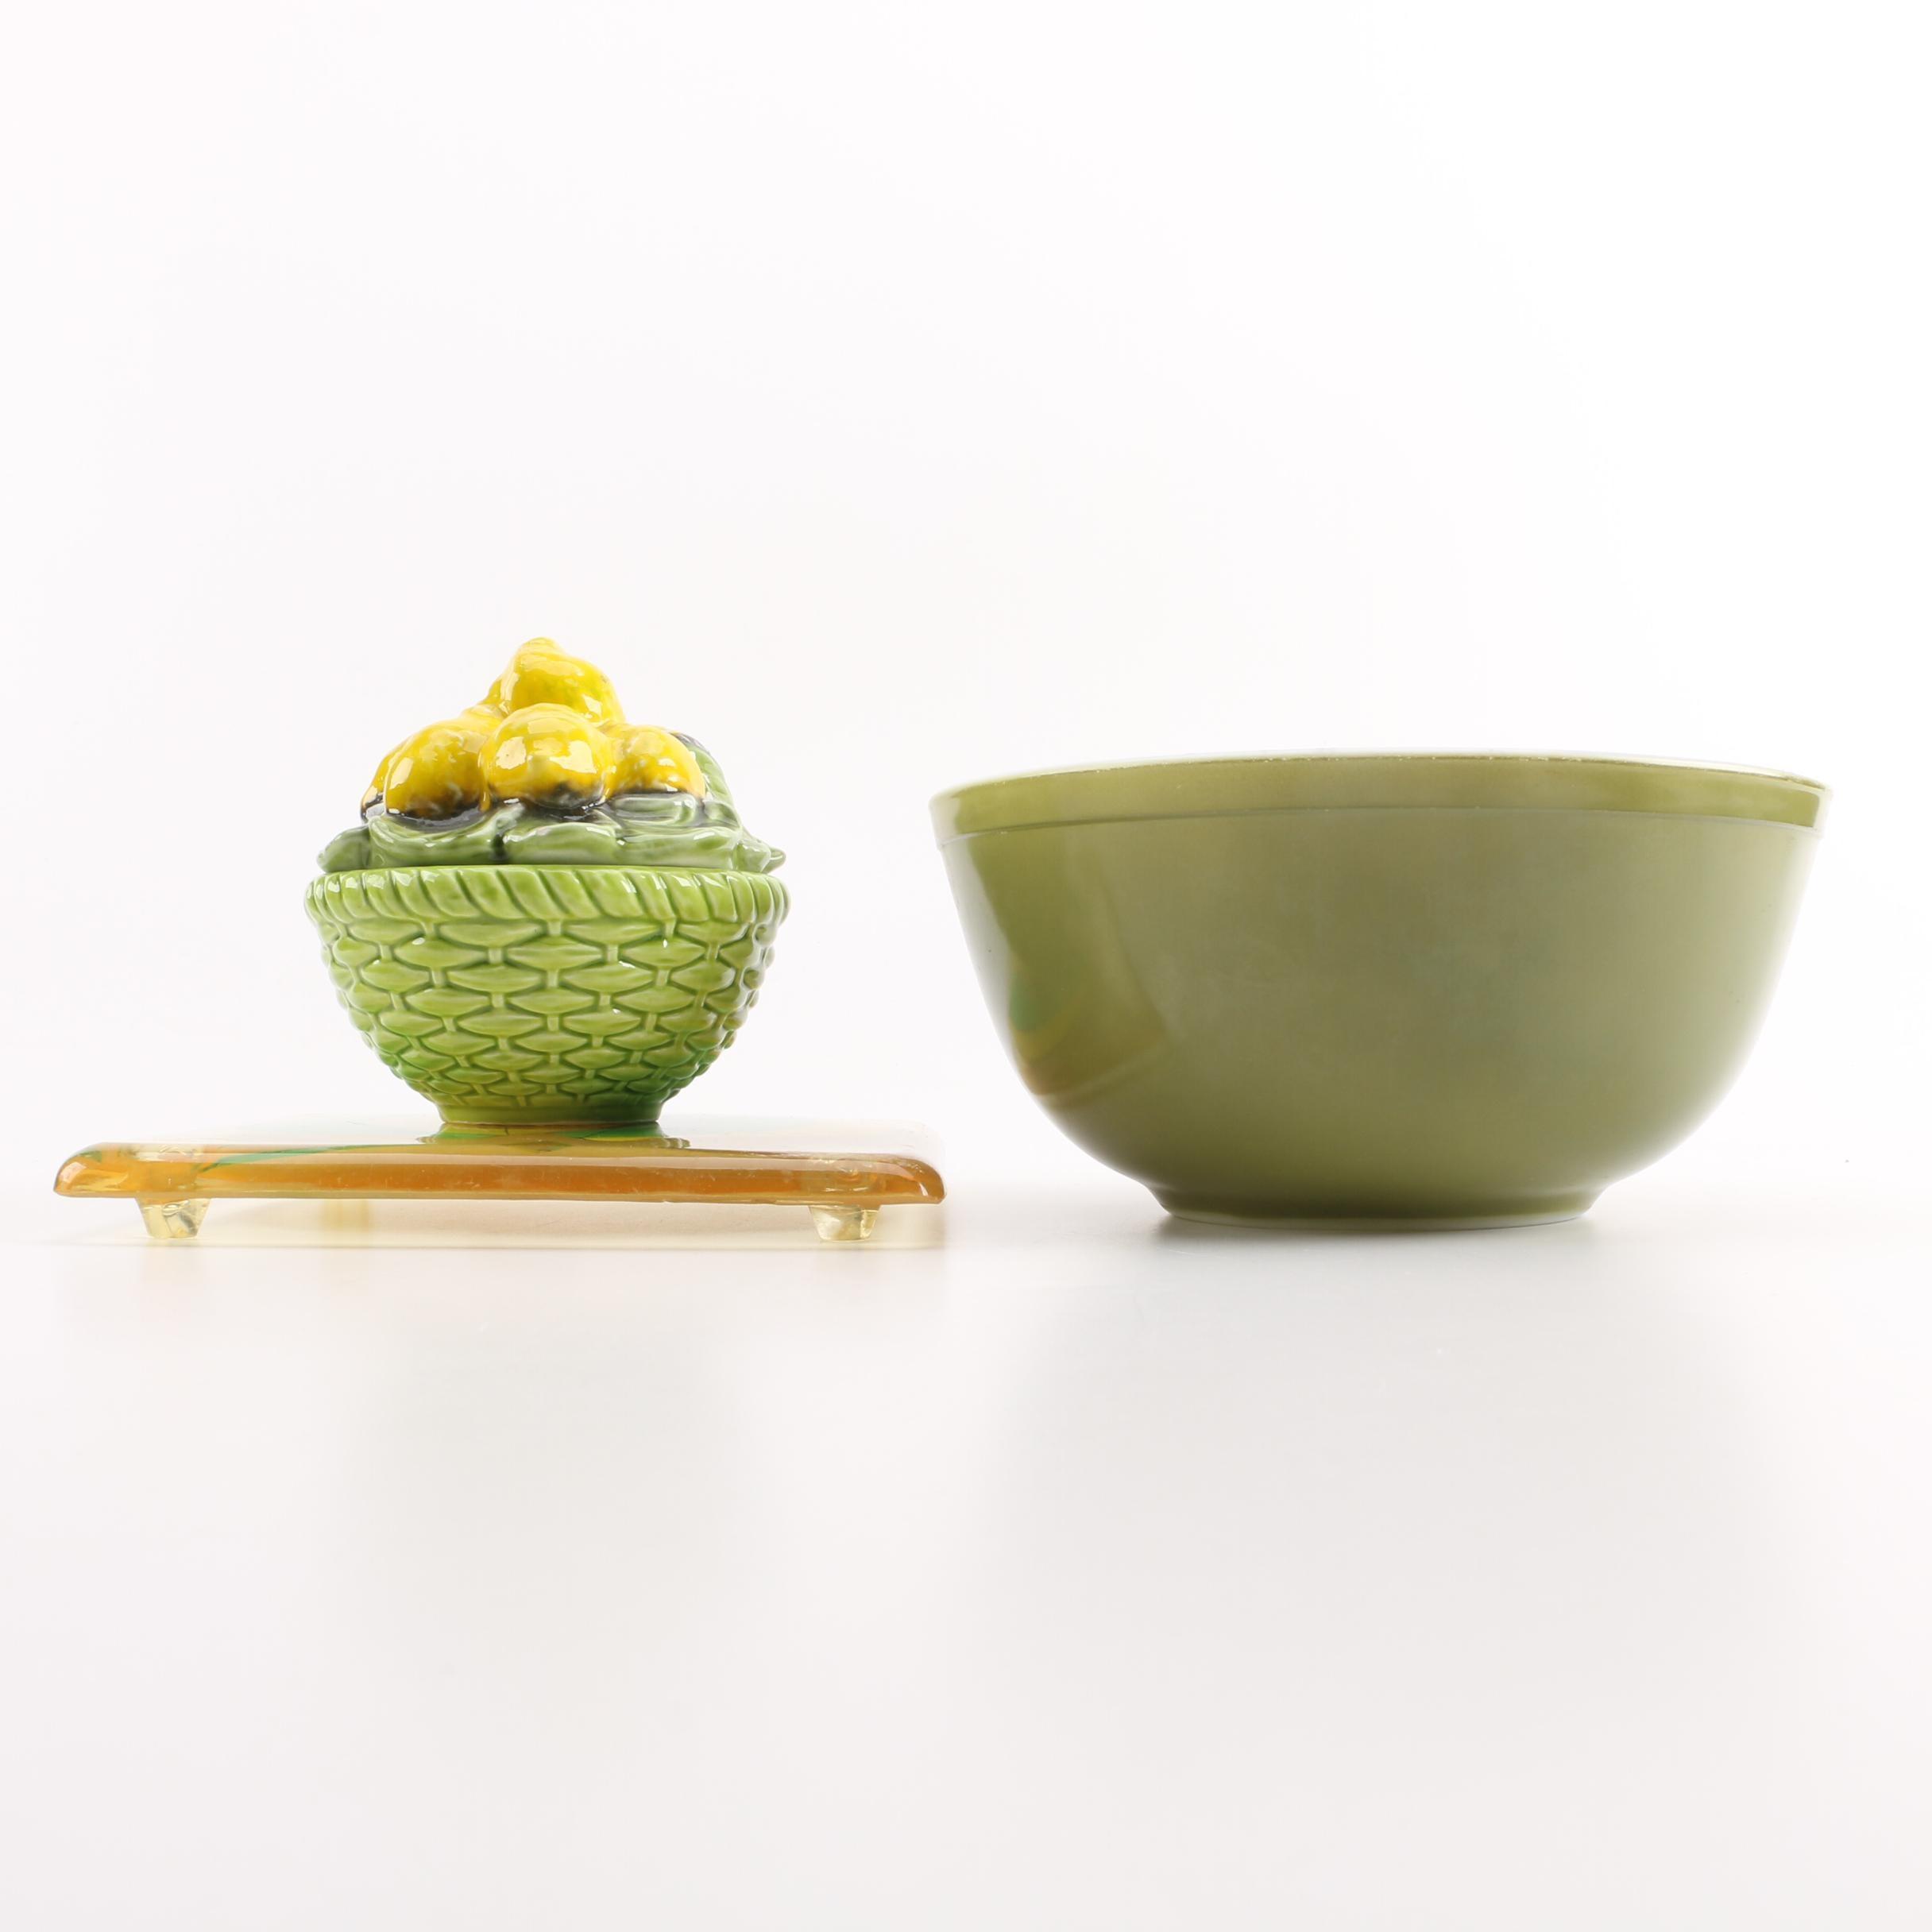 Green Pyrex Bowls and Lemon Themed Kitchenware